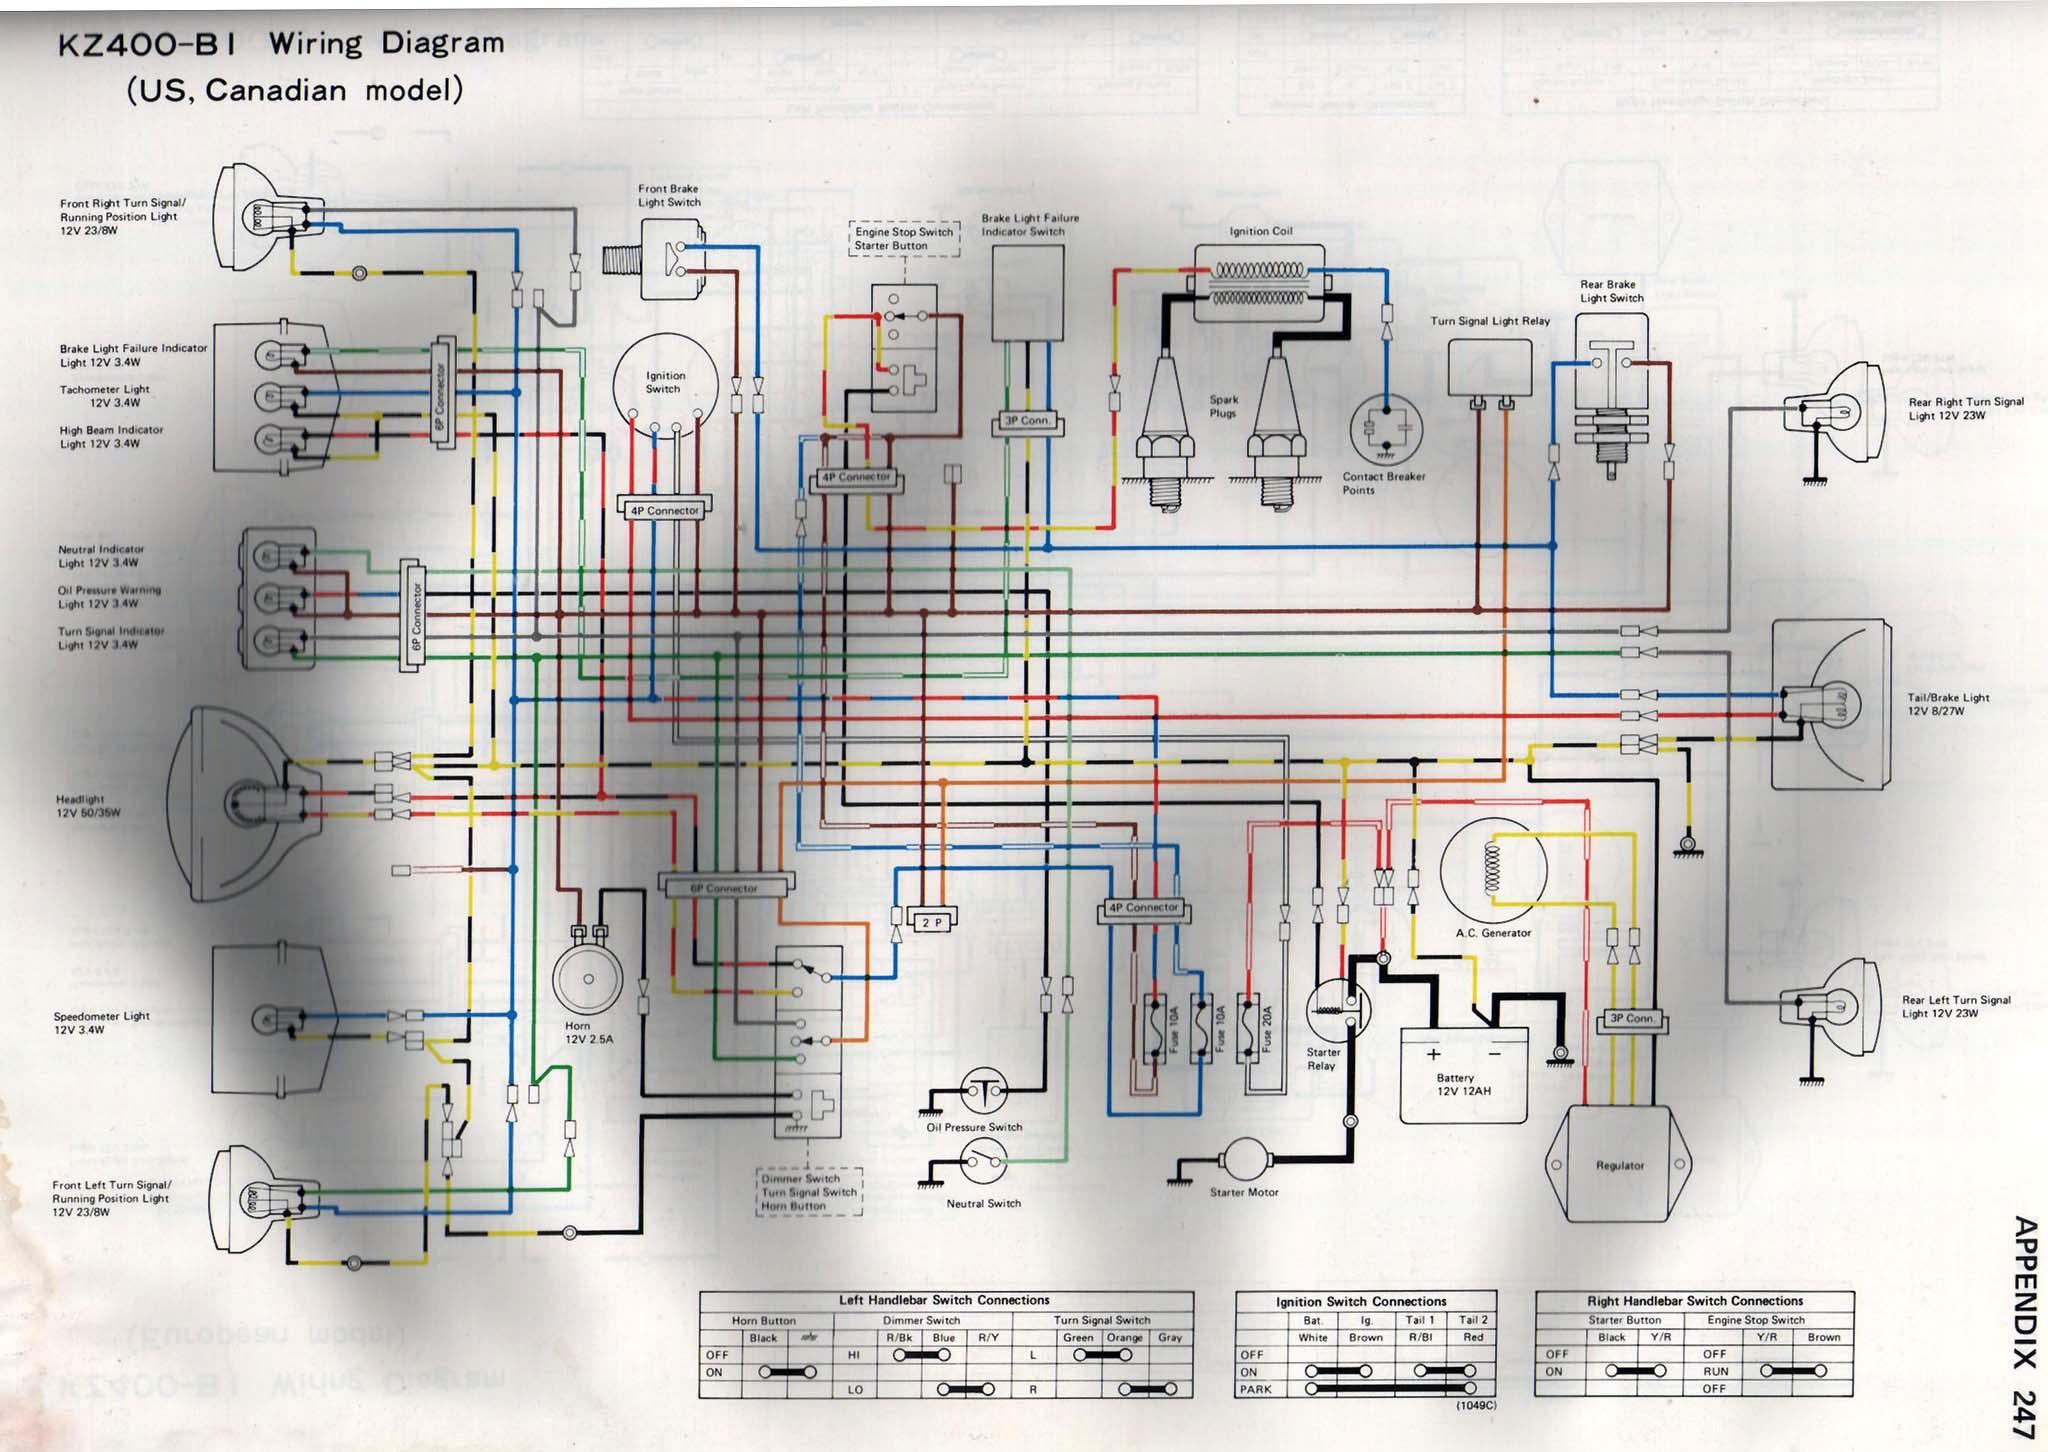 Rv 7747 Wiring Diagrams Wiring Harness Wiring Diagram Wiring